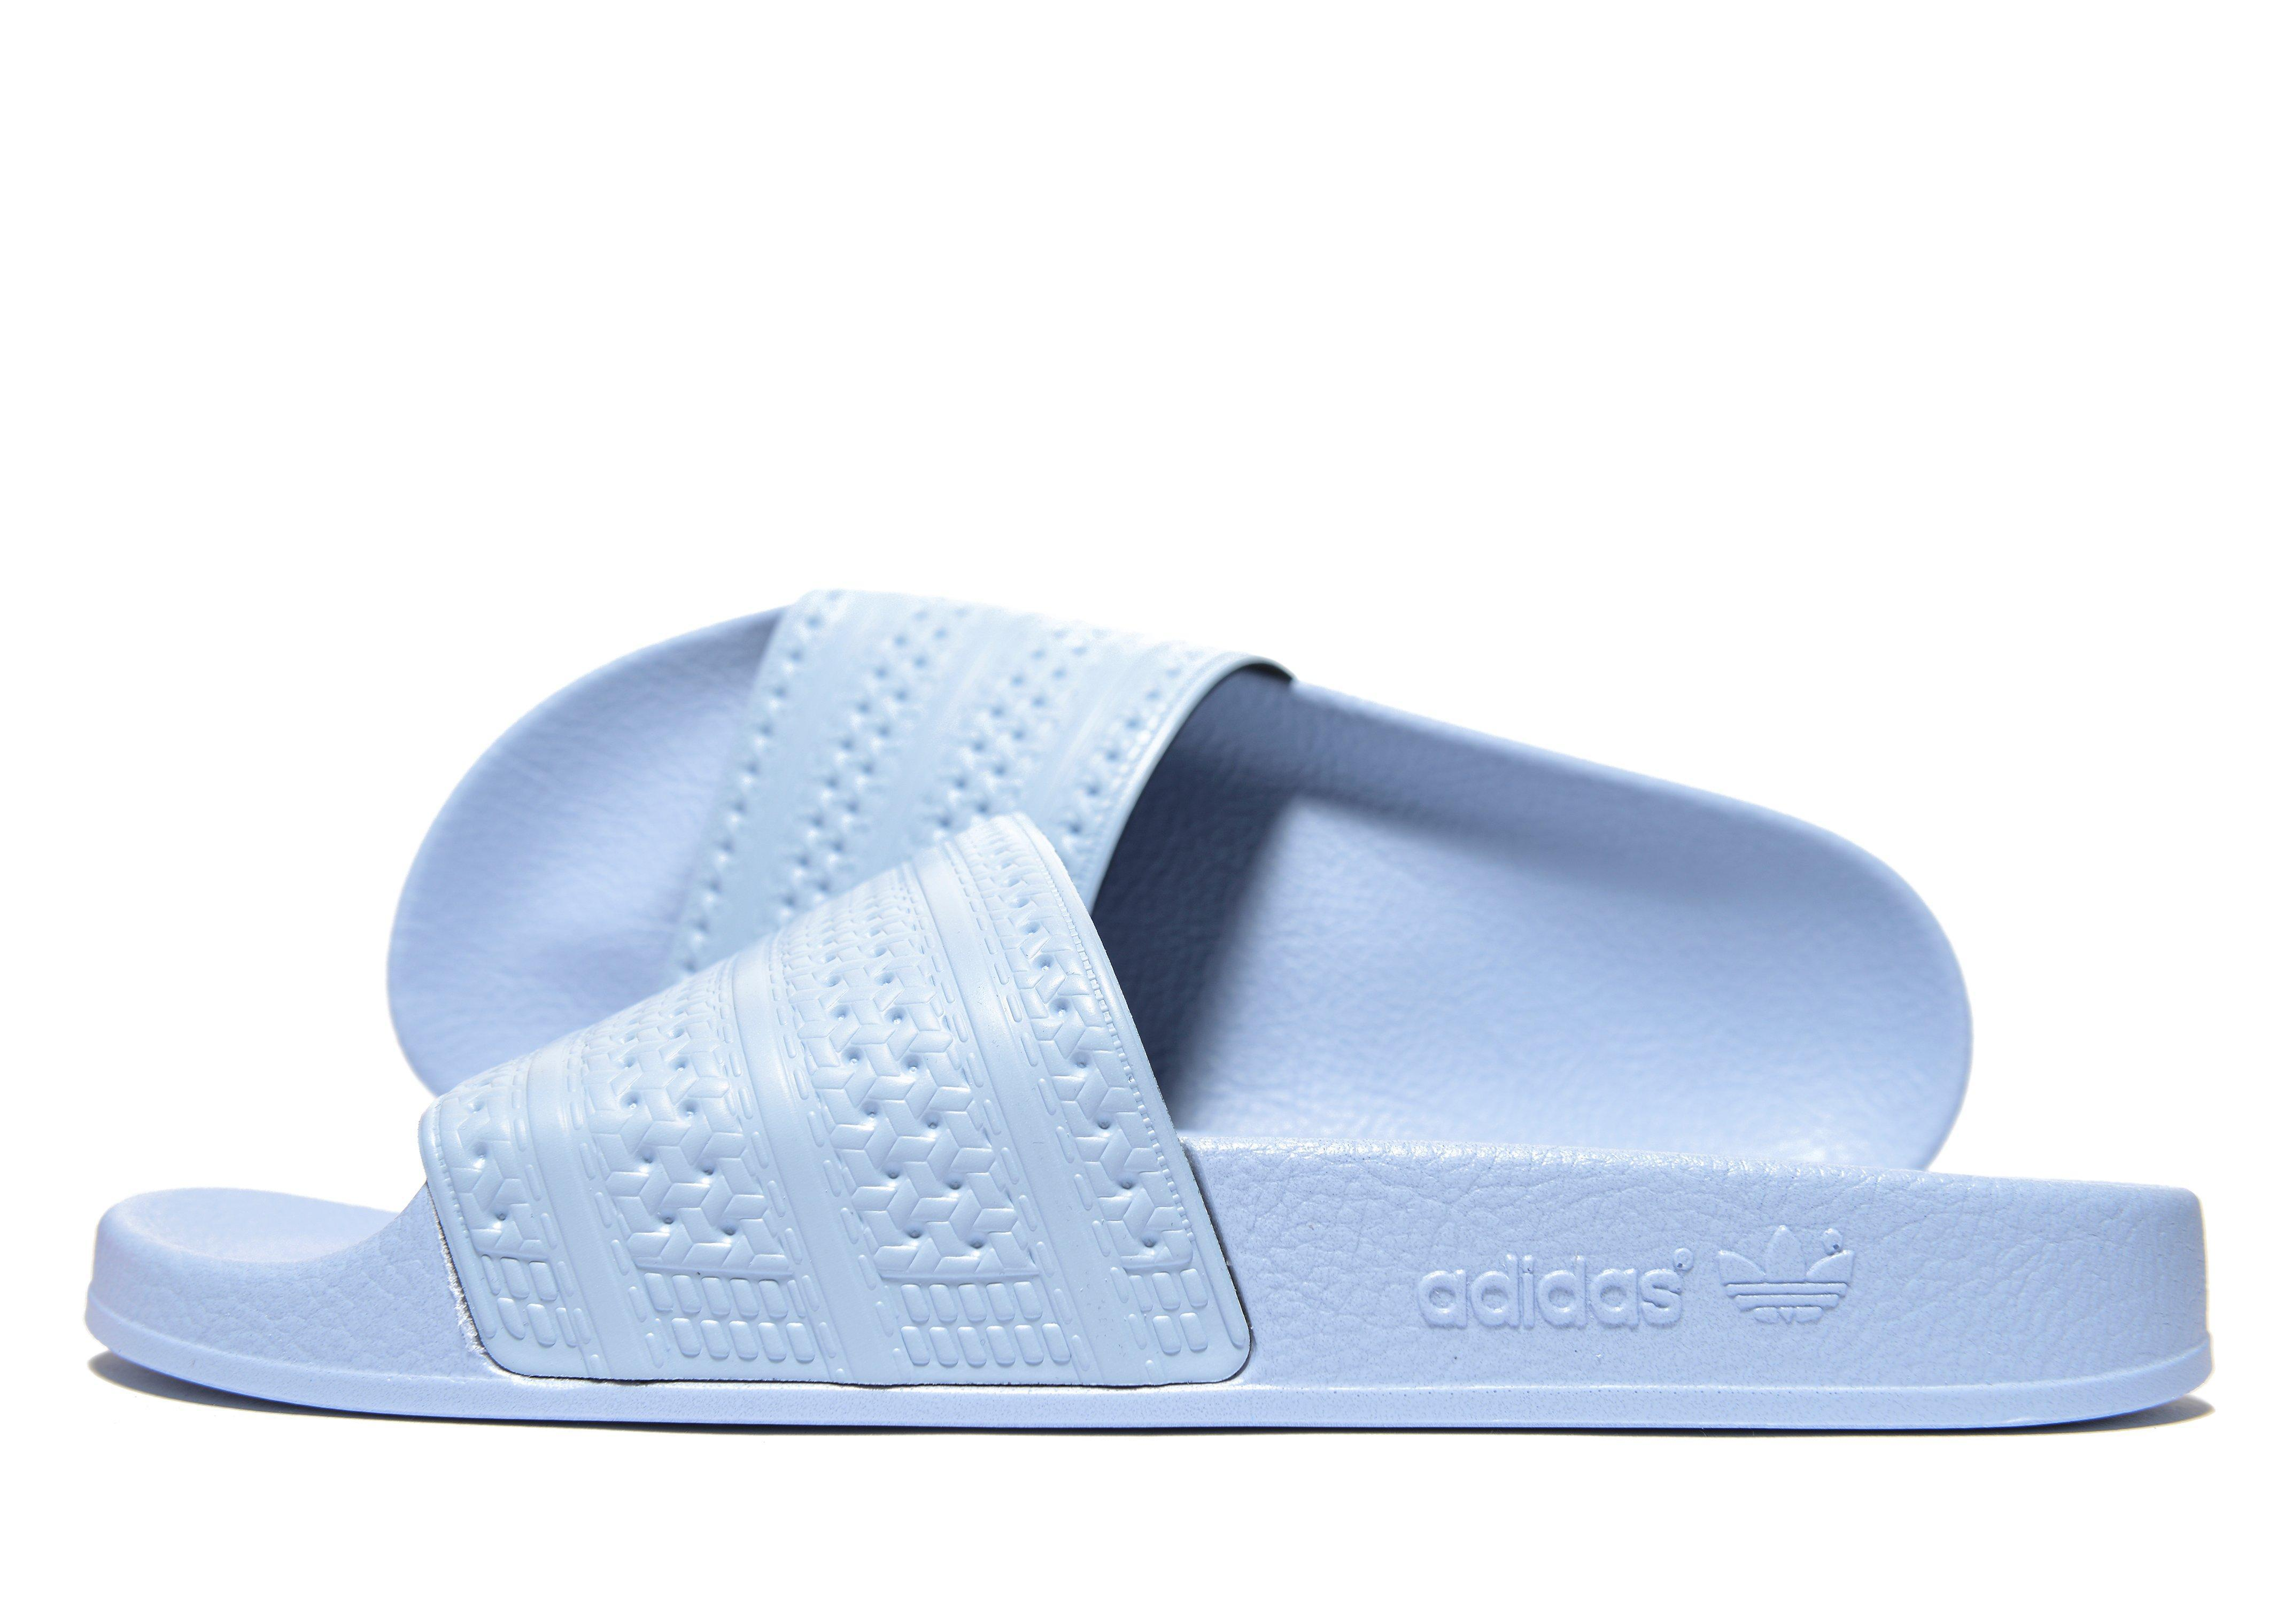 2e4888b9032eee Adidas Originals - Blue Adilette Slides for Men - Lyst. View fullscreen